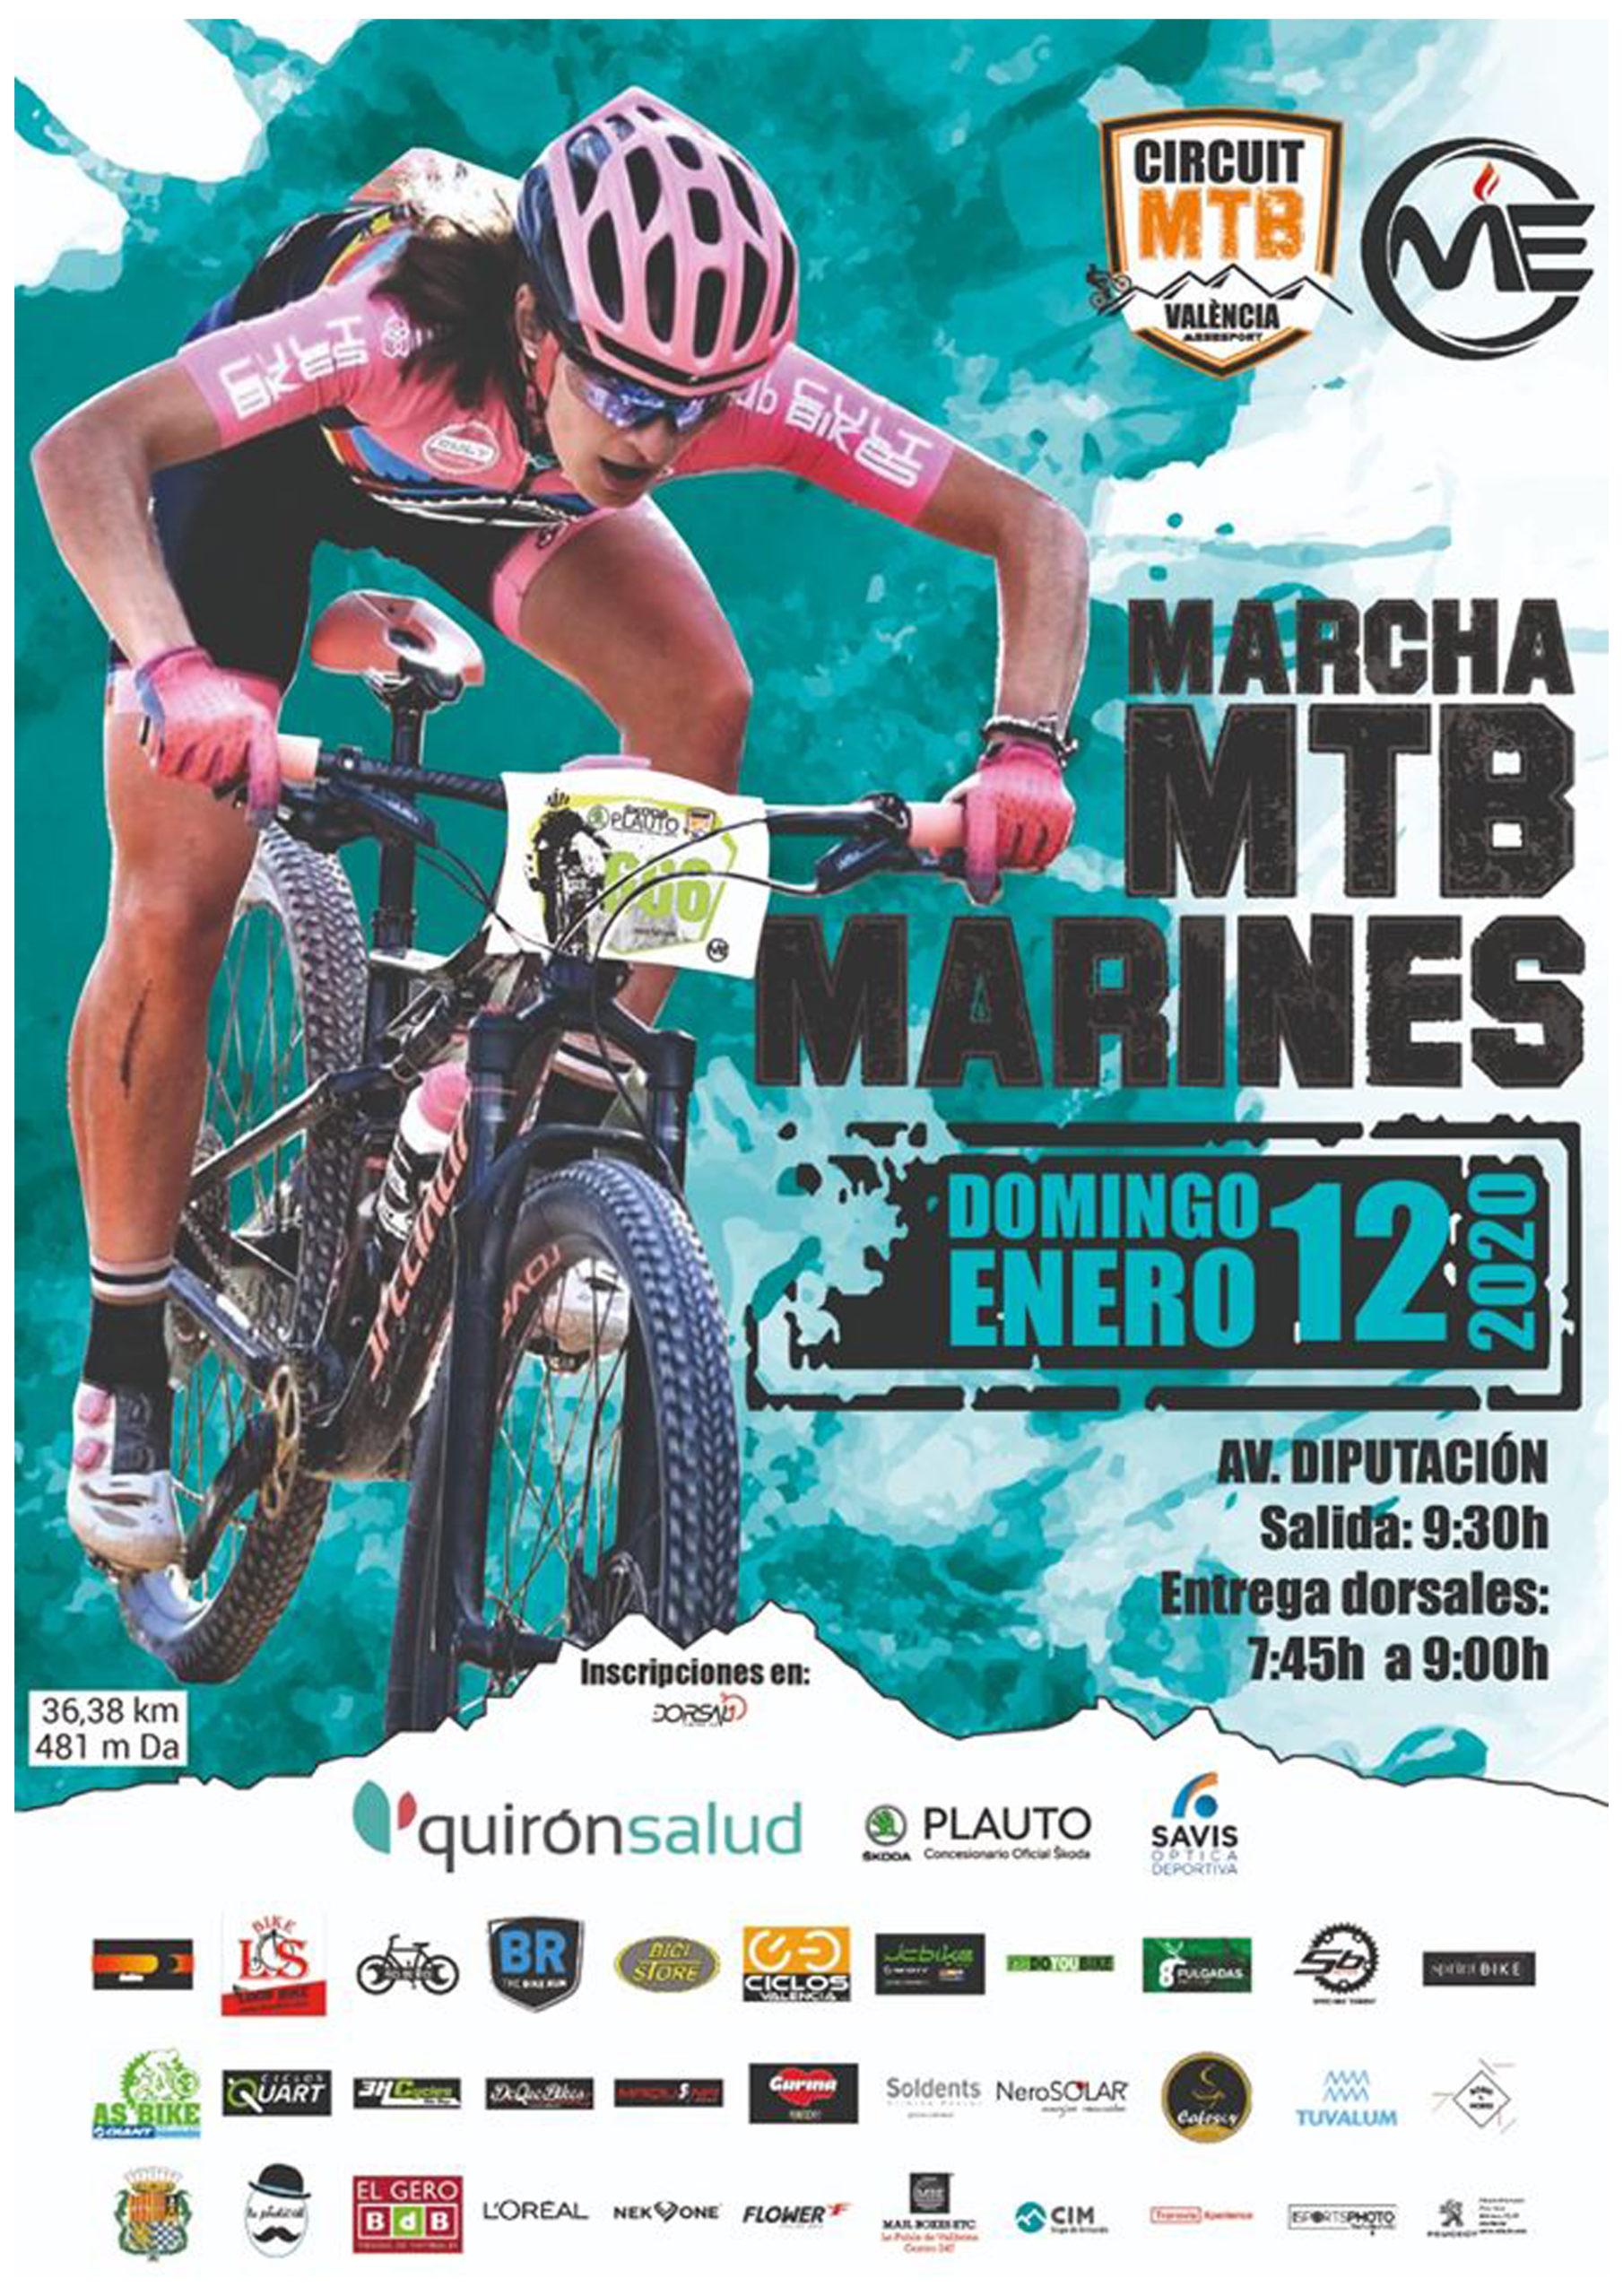 Marcha BTT, Marcha MTB, Marcha BTT Marines 2020, Marcha MTB Marines 2020 Circuit mtb Valencia, Circuito Serrania, Mountain bike,